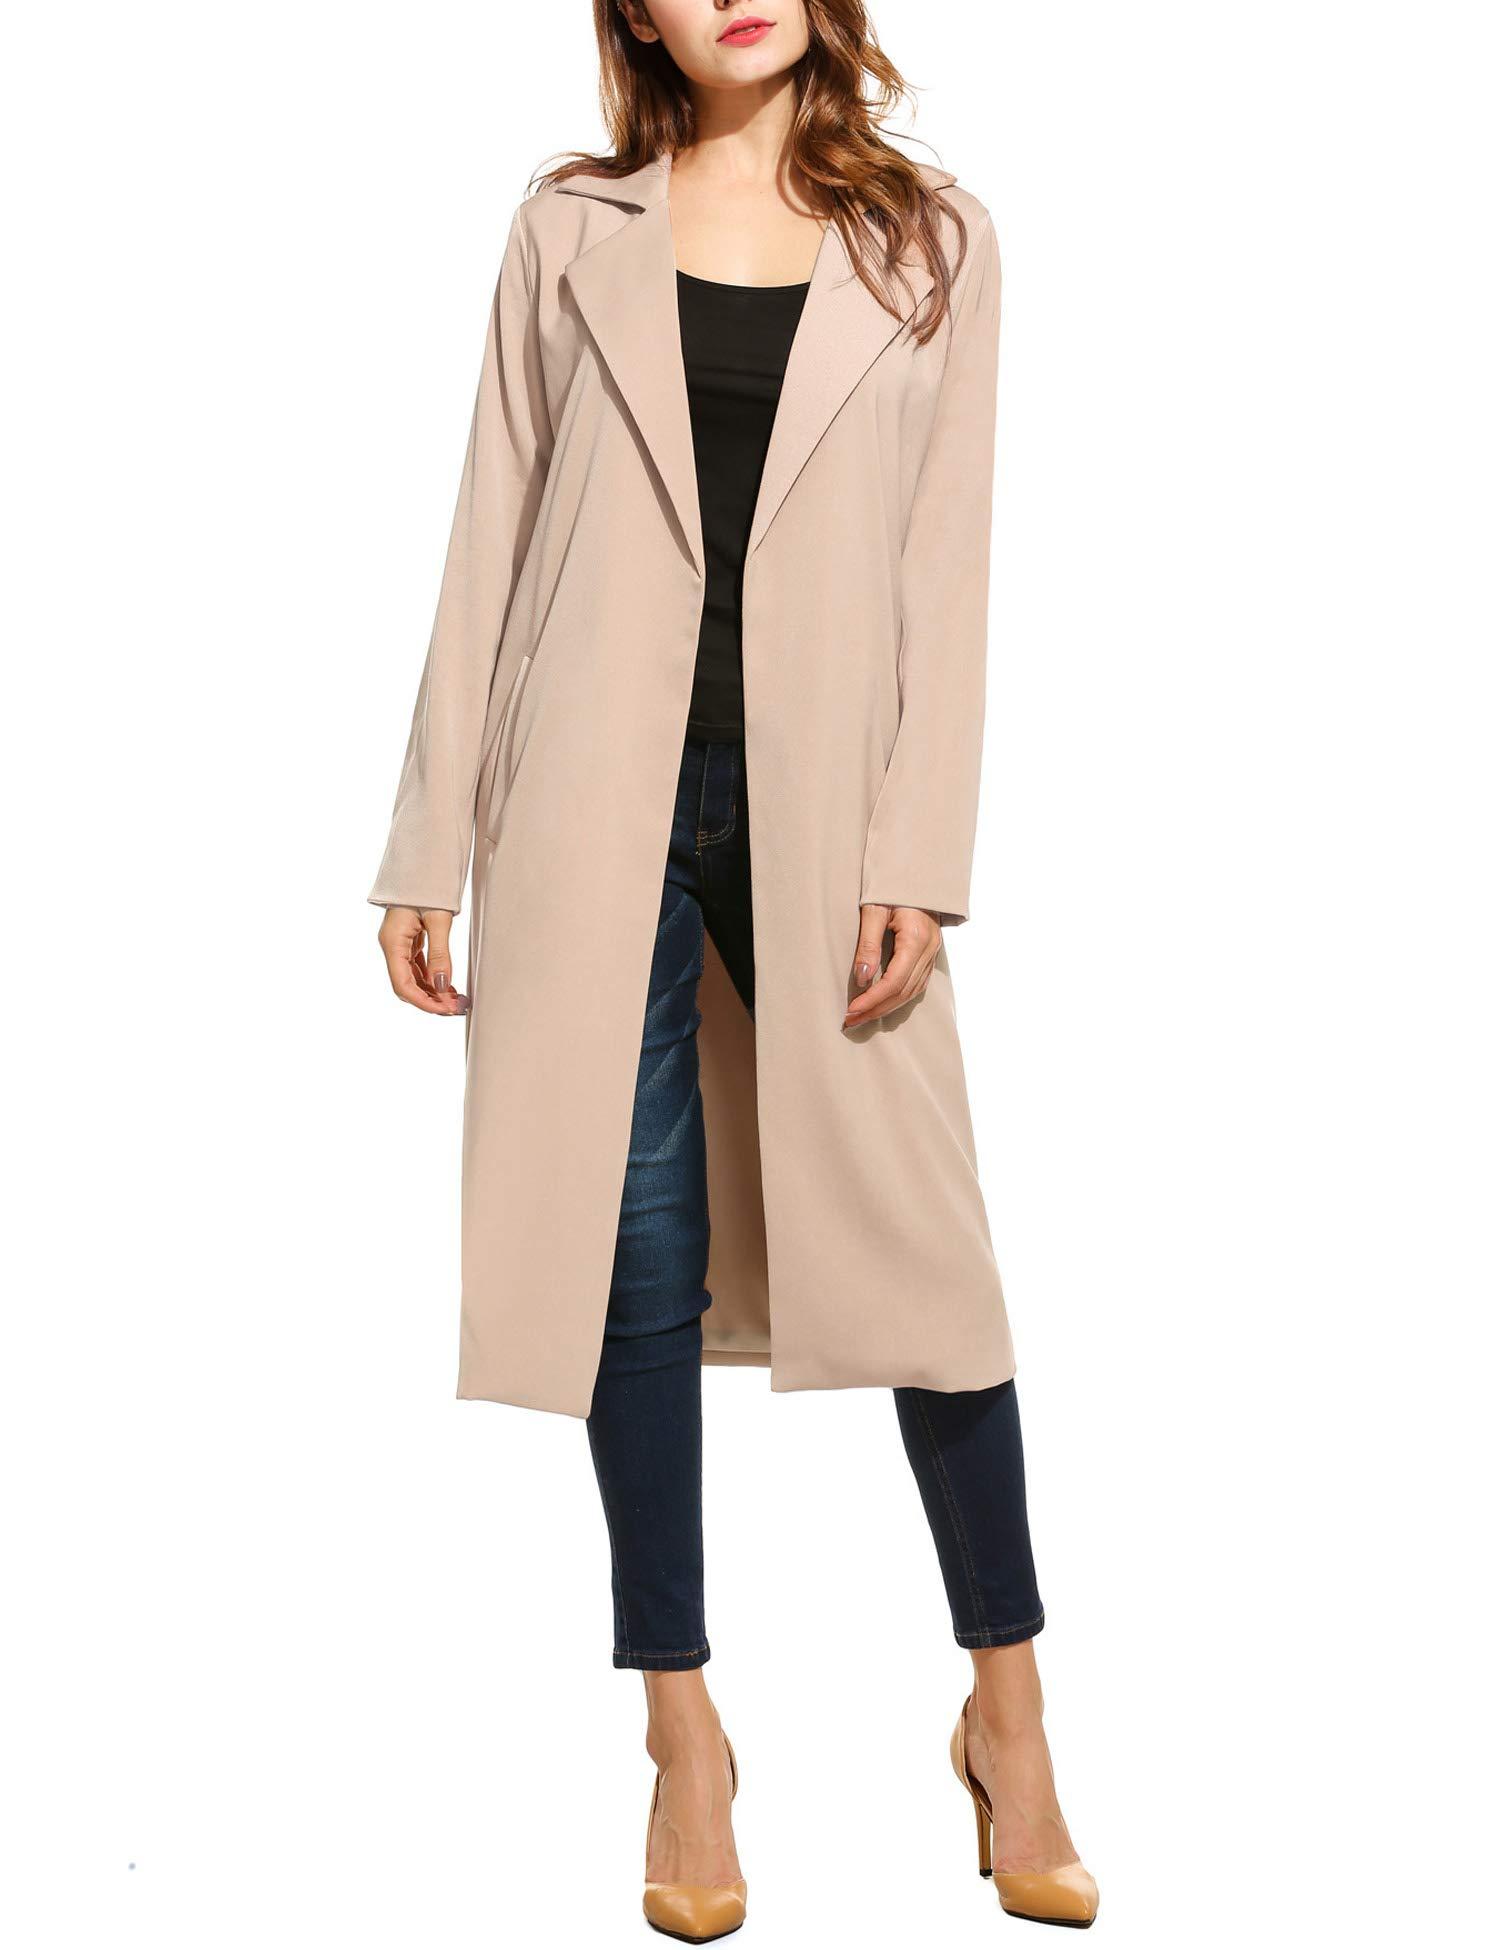 UNibelle Winter Long Blazer Women's Open Front Long Trench Coats Lightweight Casual Blazer Cardigans (Khaki, X-Large) by UNibelle